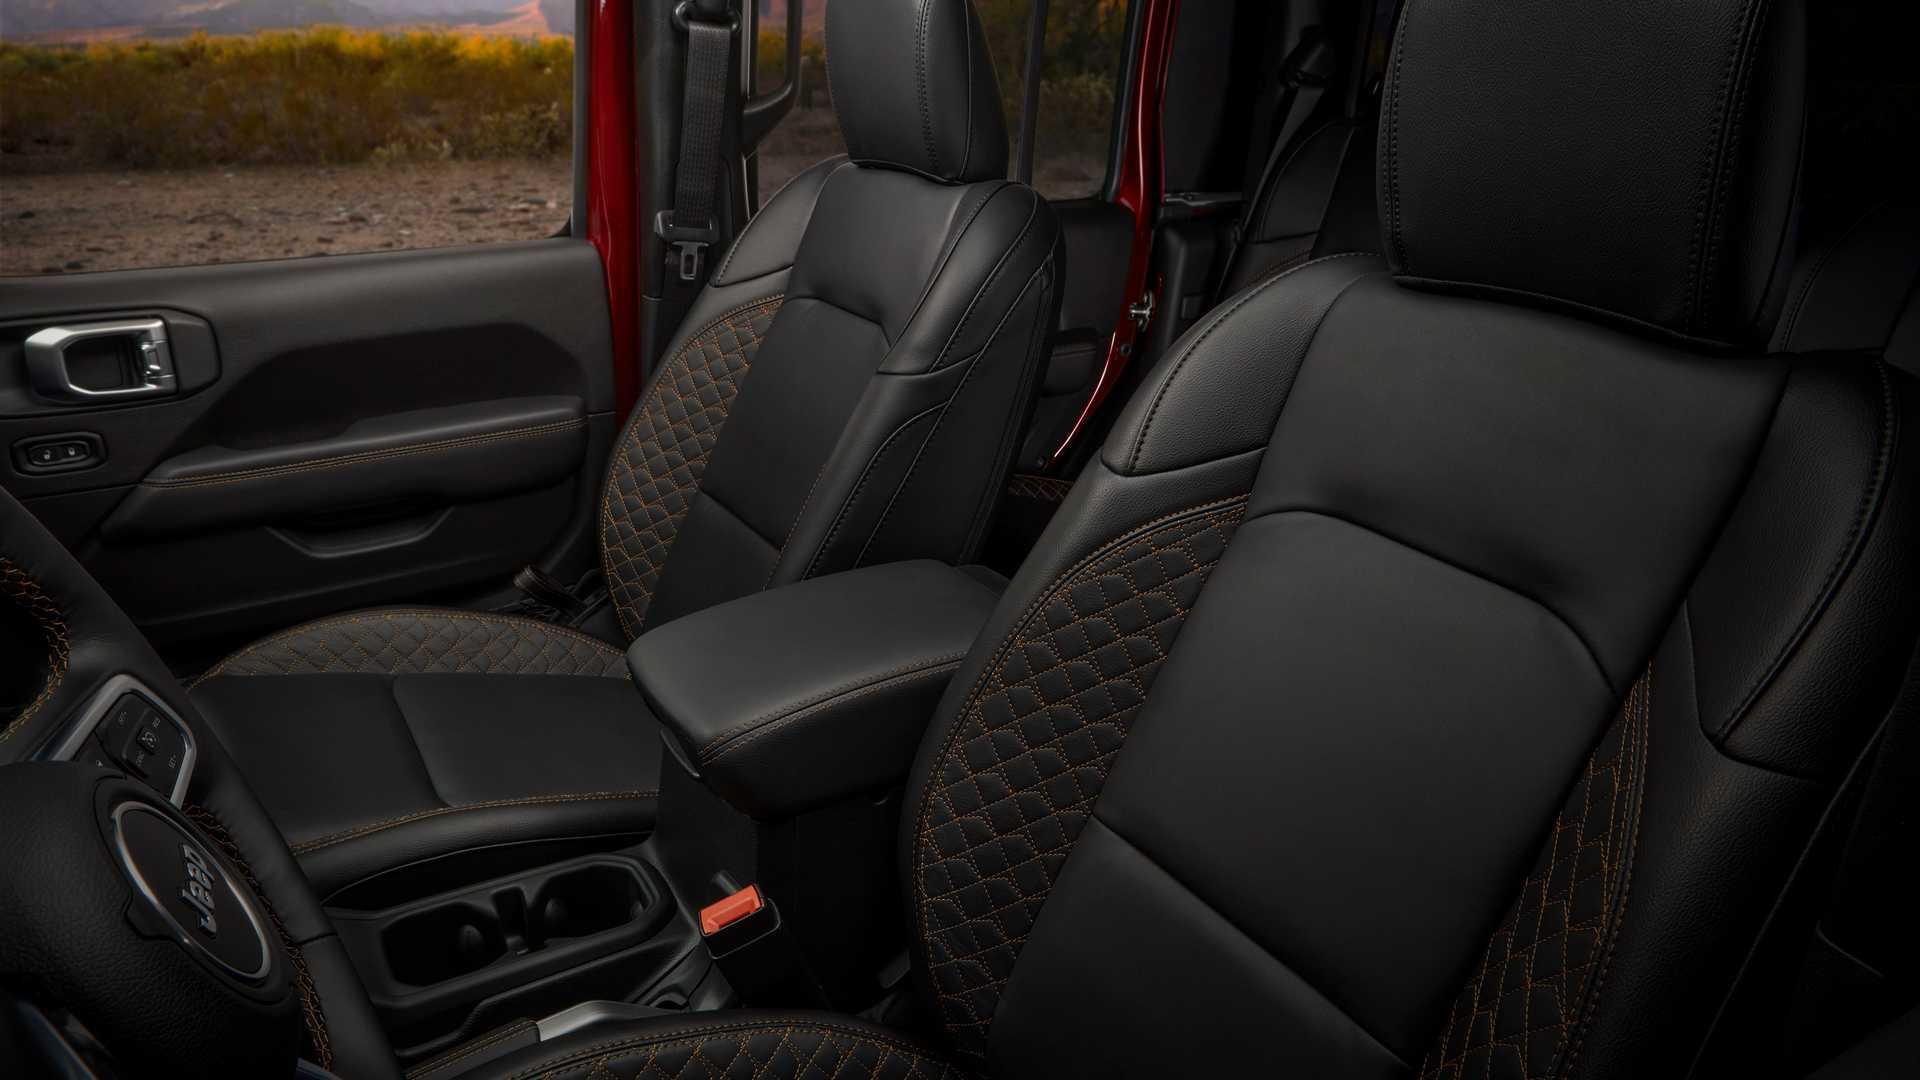 2020-jeep-gladiator-high-altitude-4